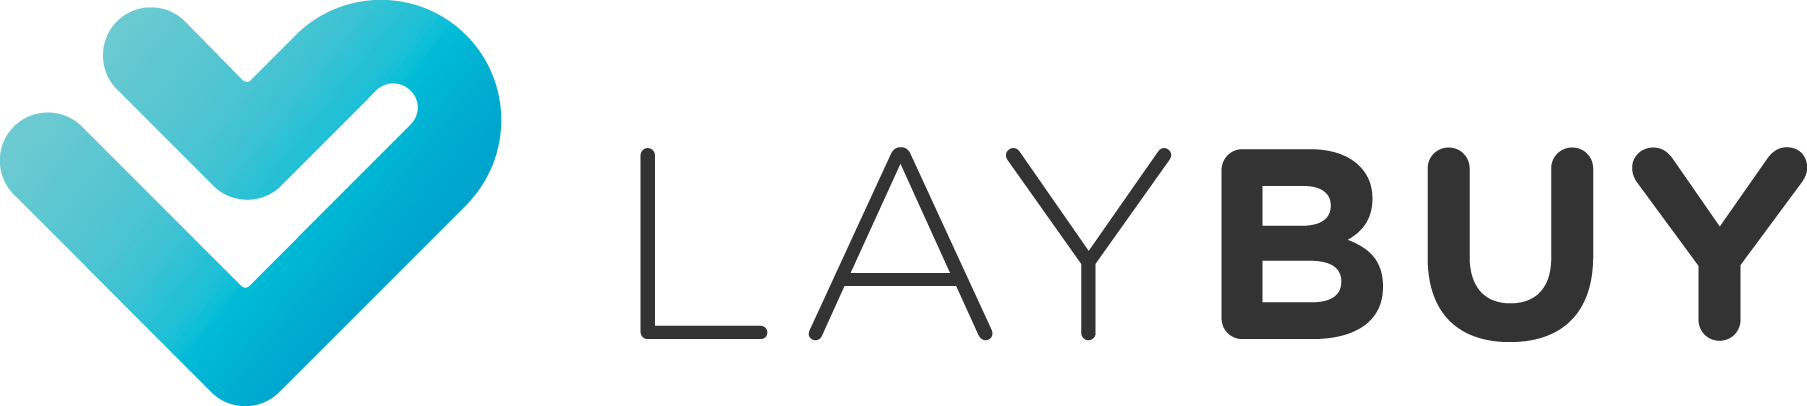 Laybuy logo image png.png